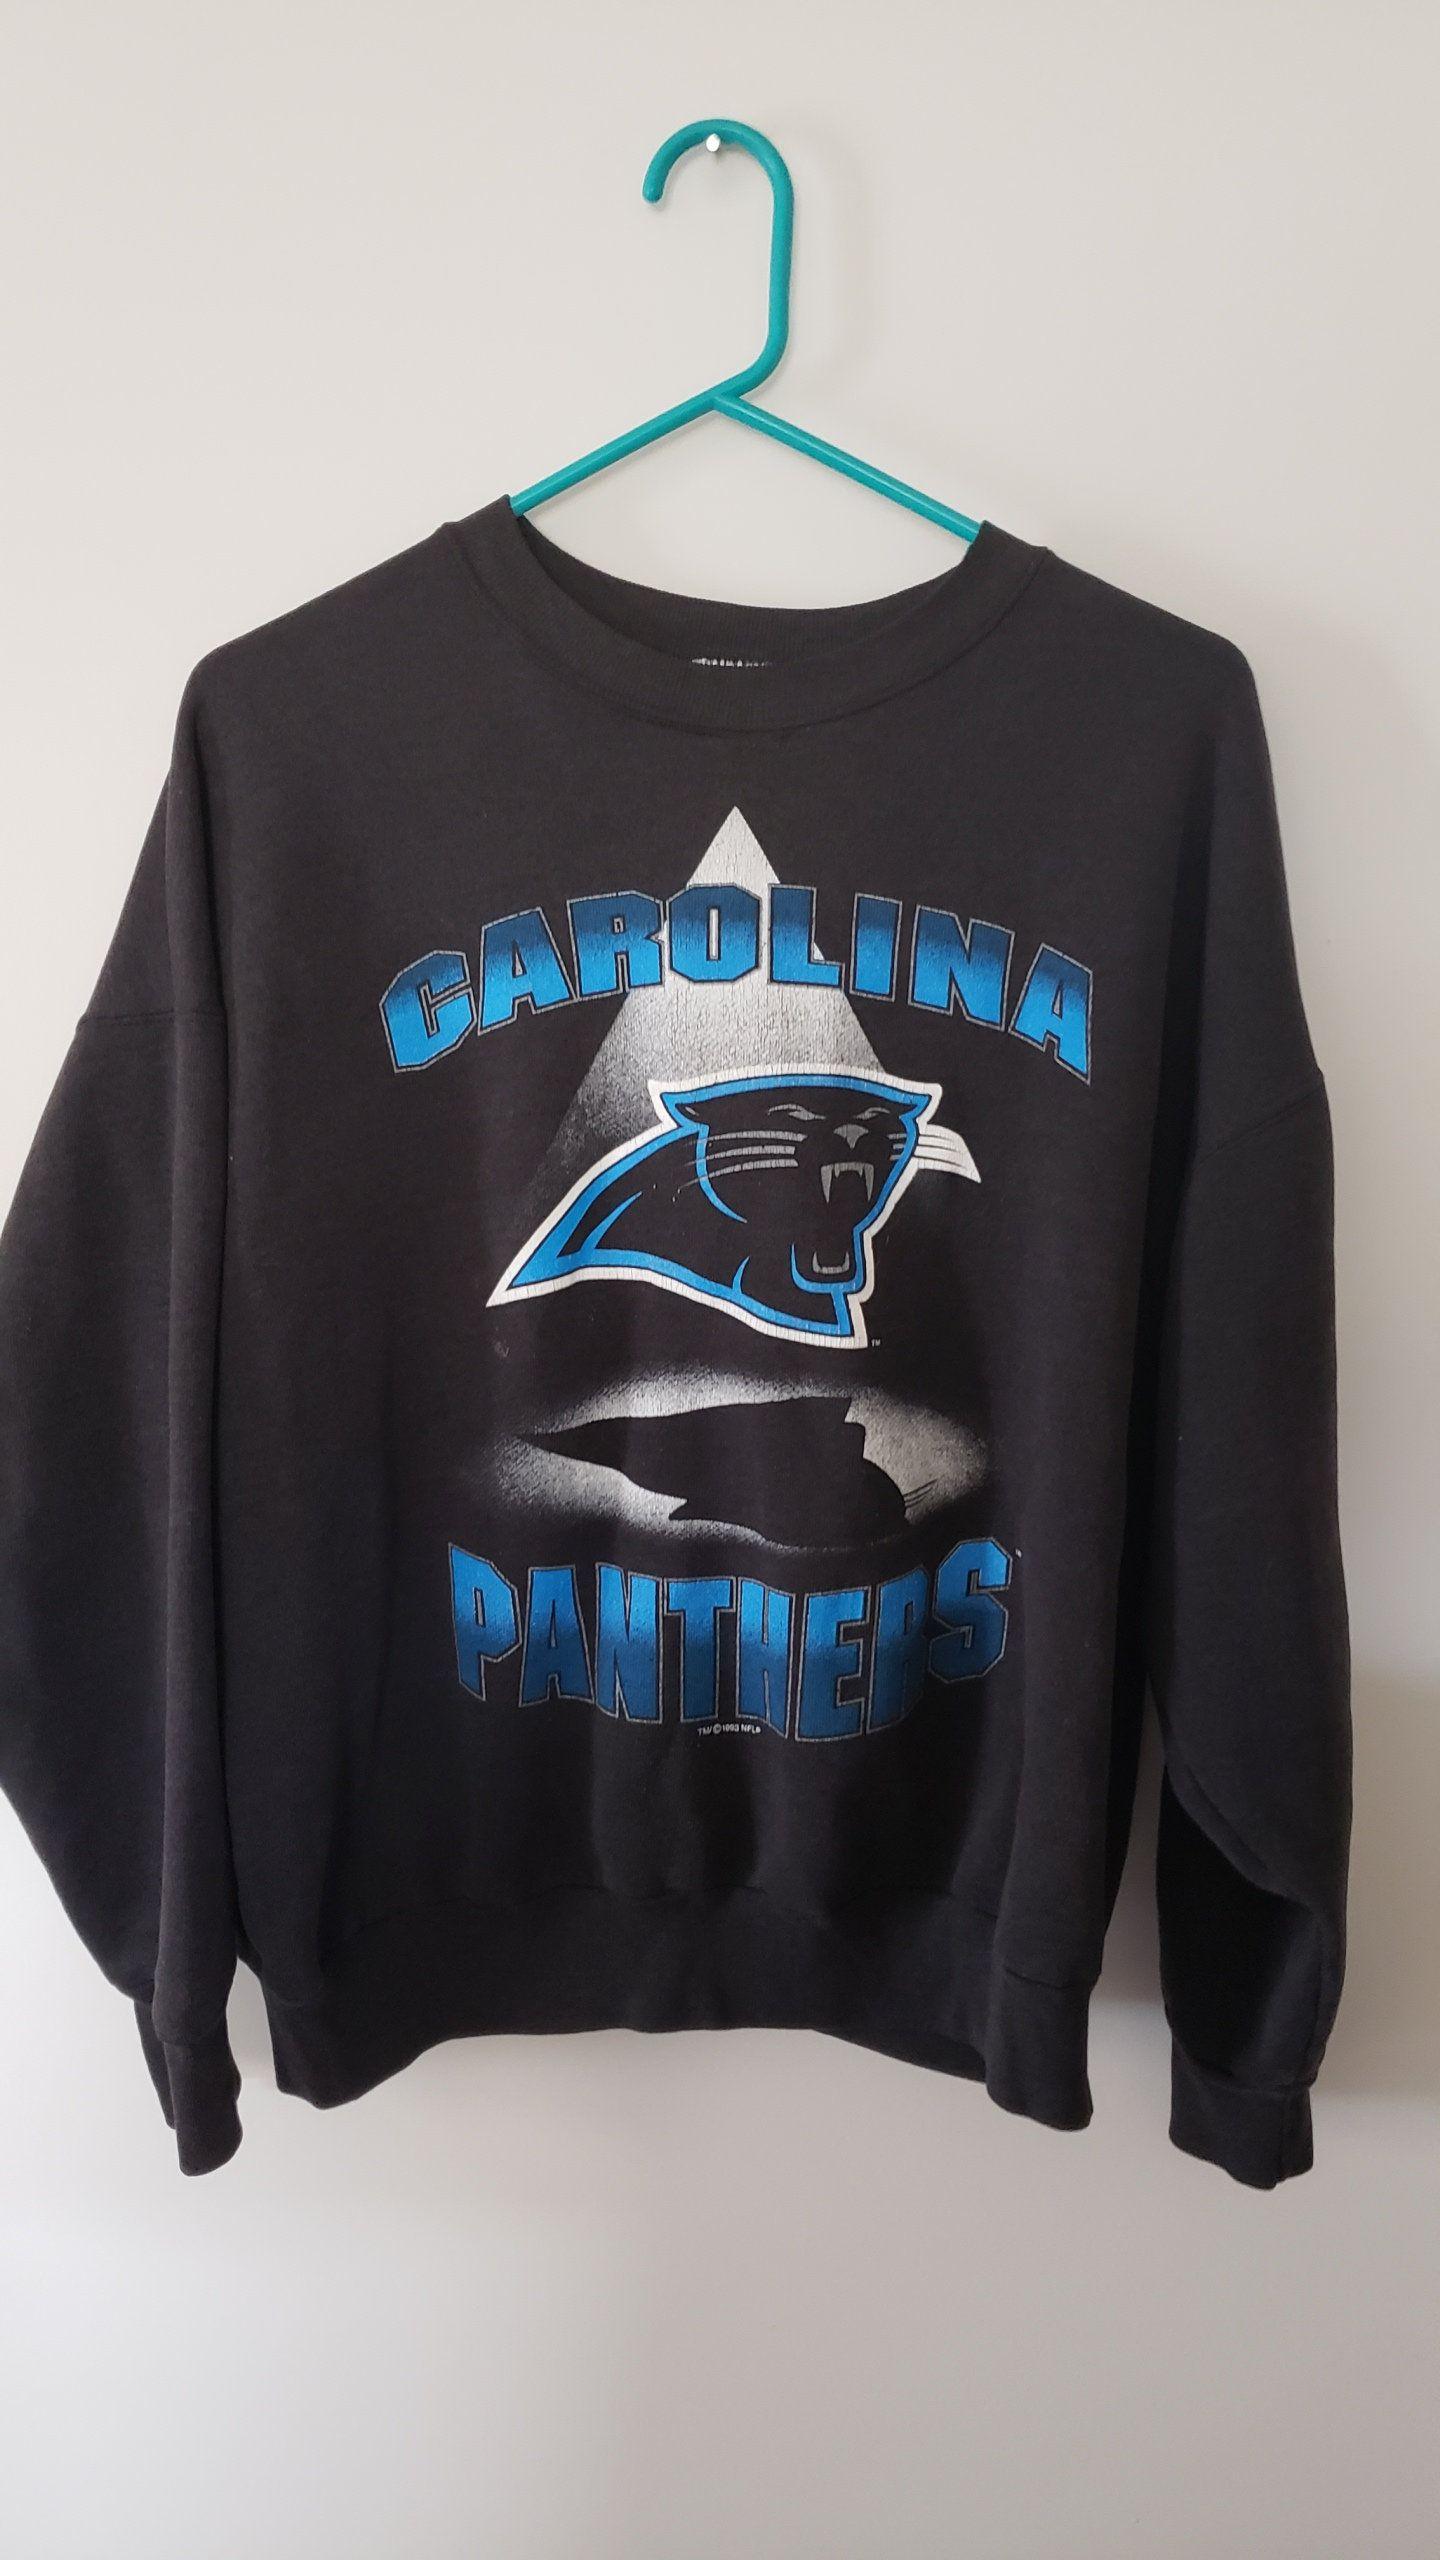 check out 77eca 1b55e Vintage 90's NFL Carolina Panthers Crewneck Sweatshirt ...